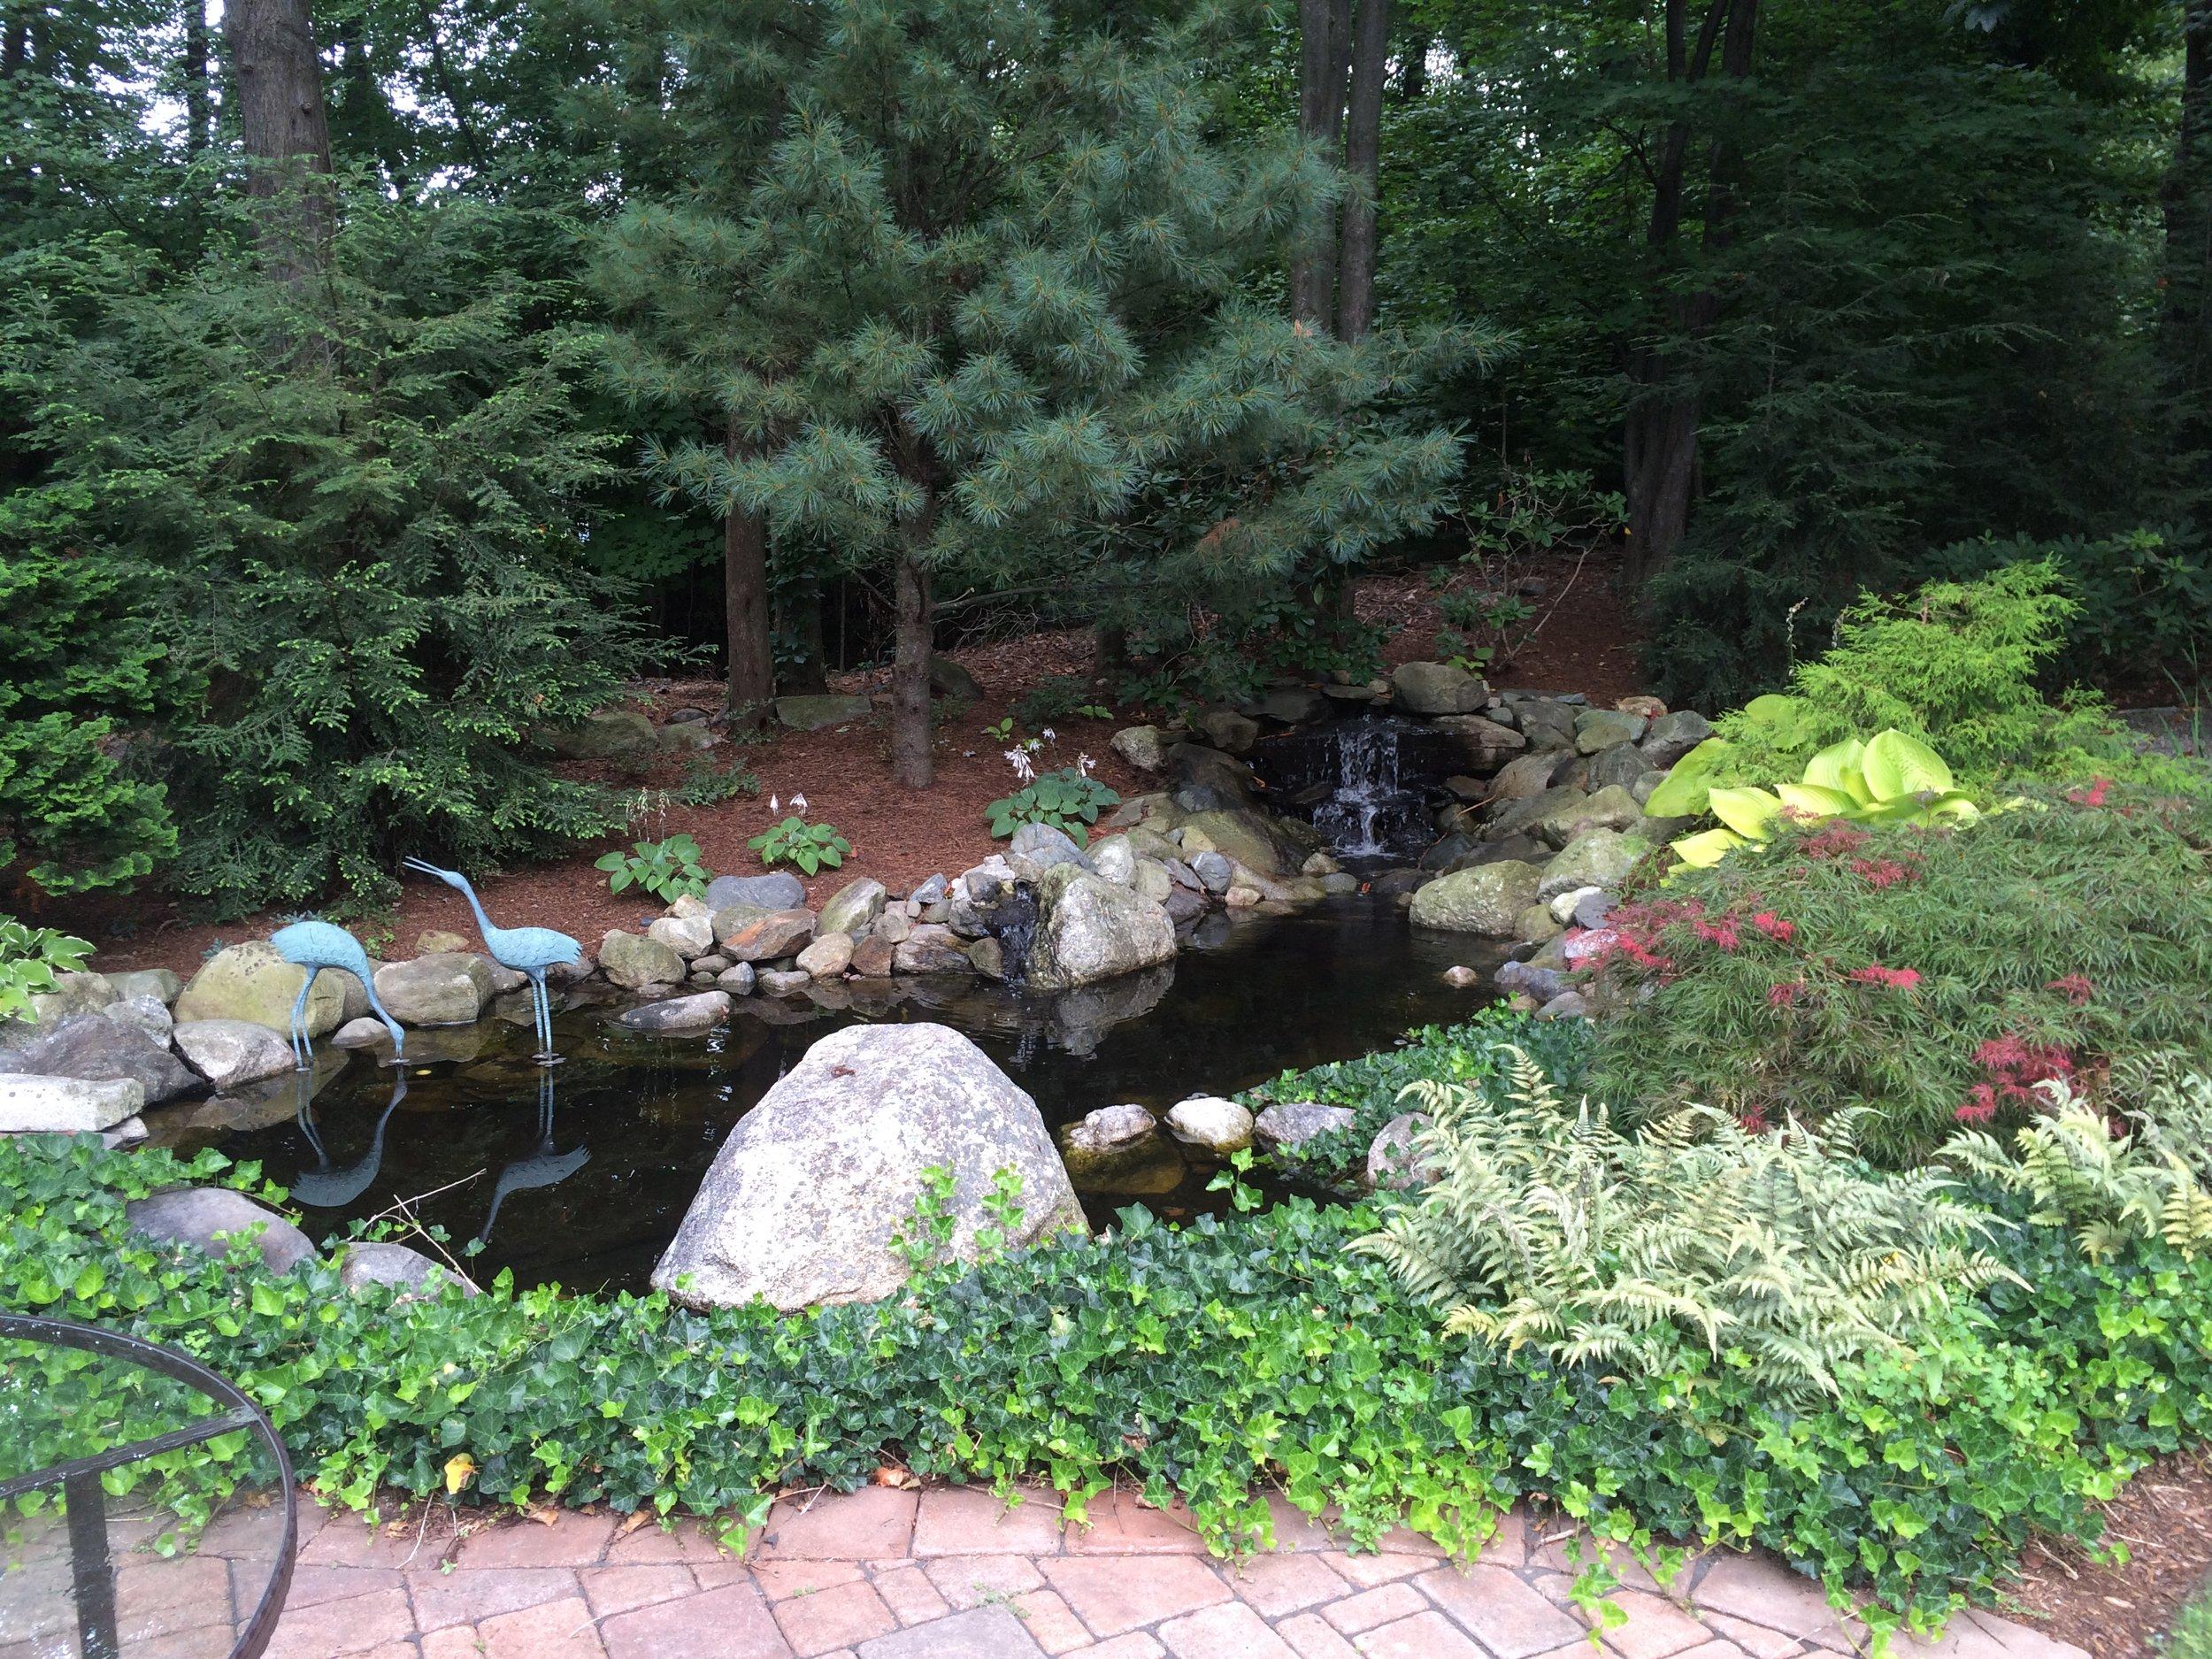 Plantings, edging, lawn mowing